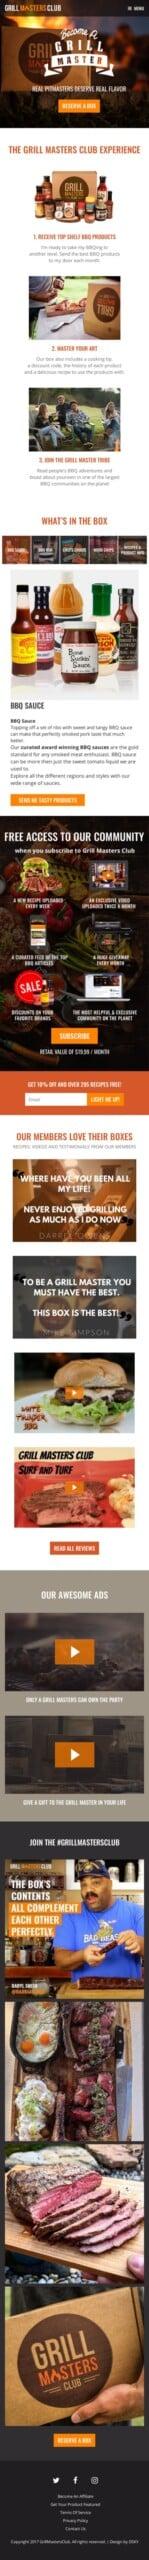 grillmastersclub.com Coupon